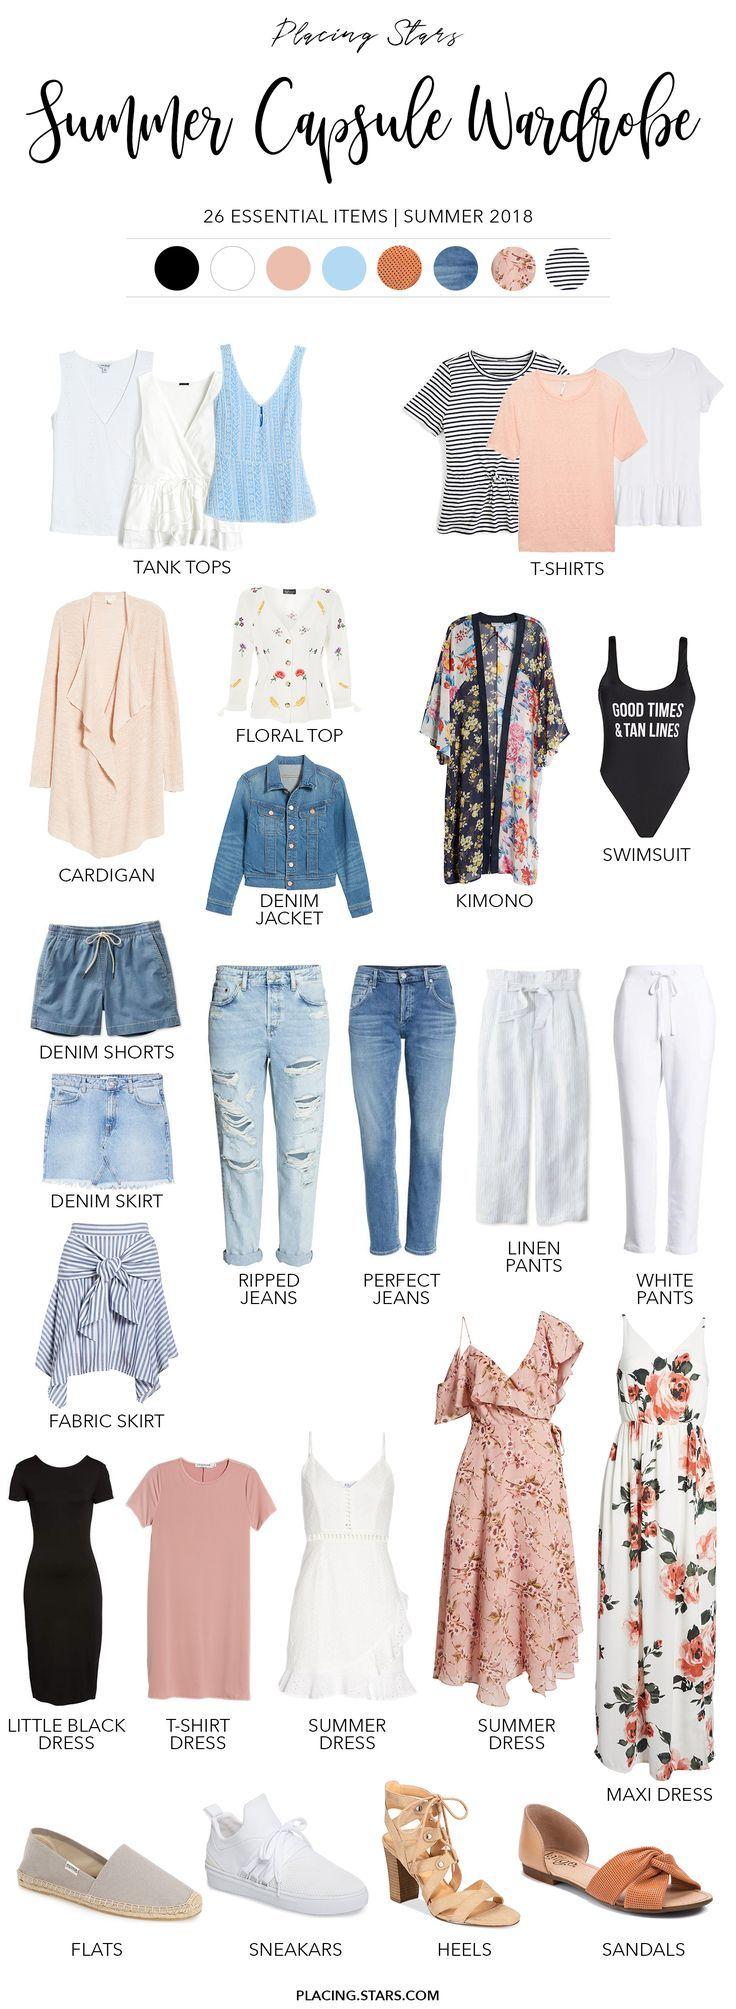 Summer Capsule Wardrobe 2018 #cuteoutfitsforsummer